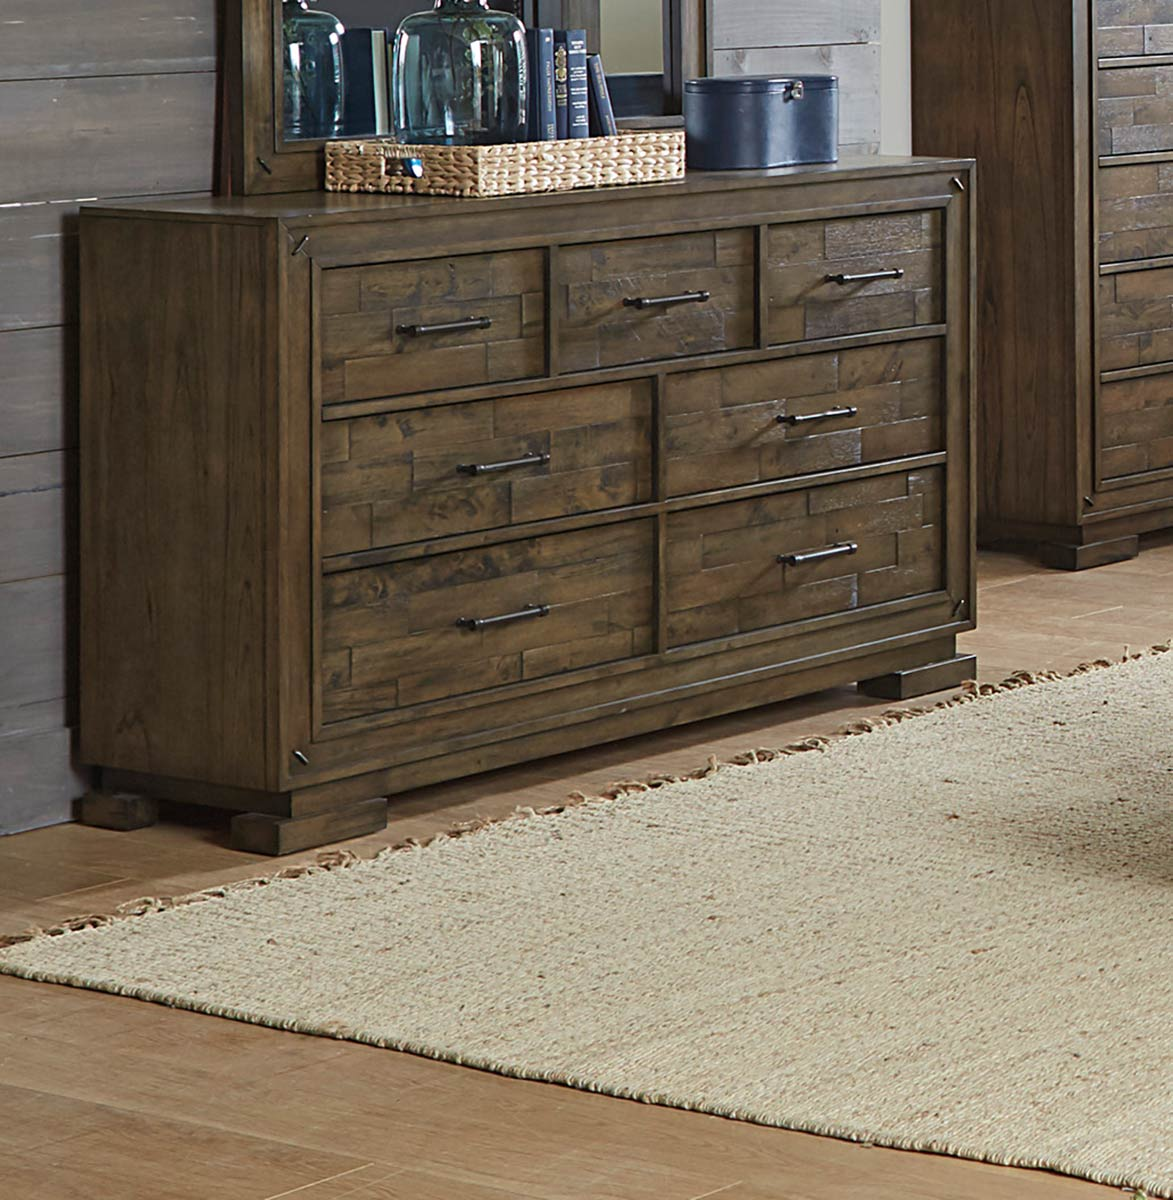 Homelegance Griffon Dresser - Antique Brown